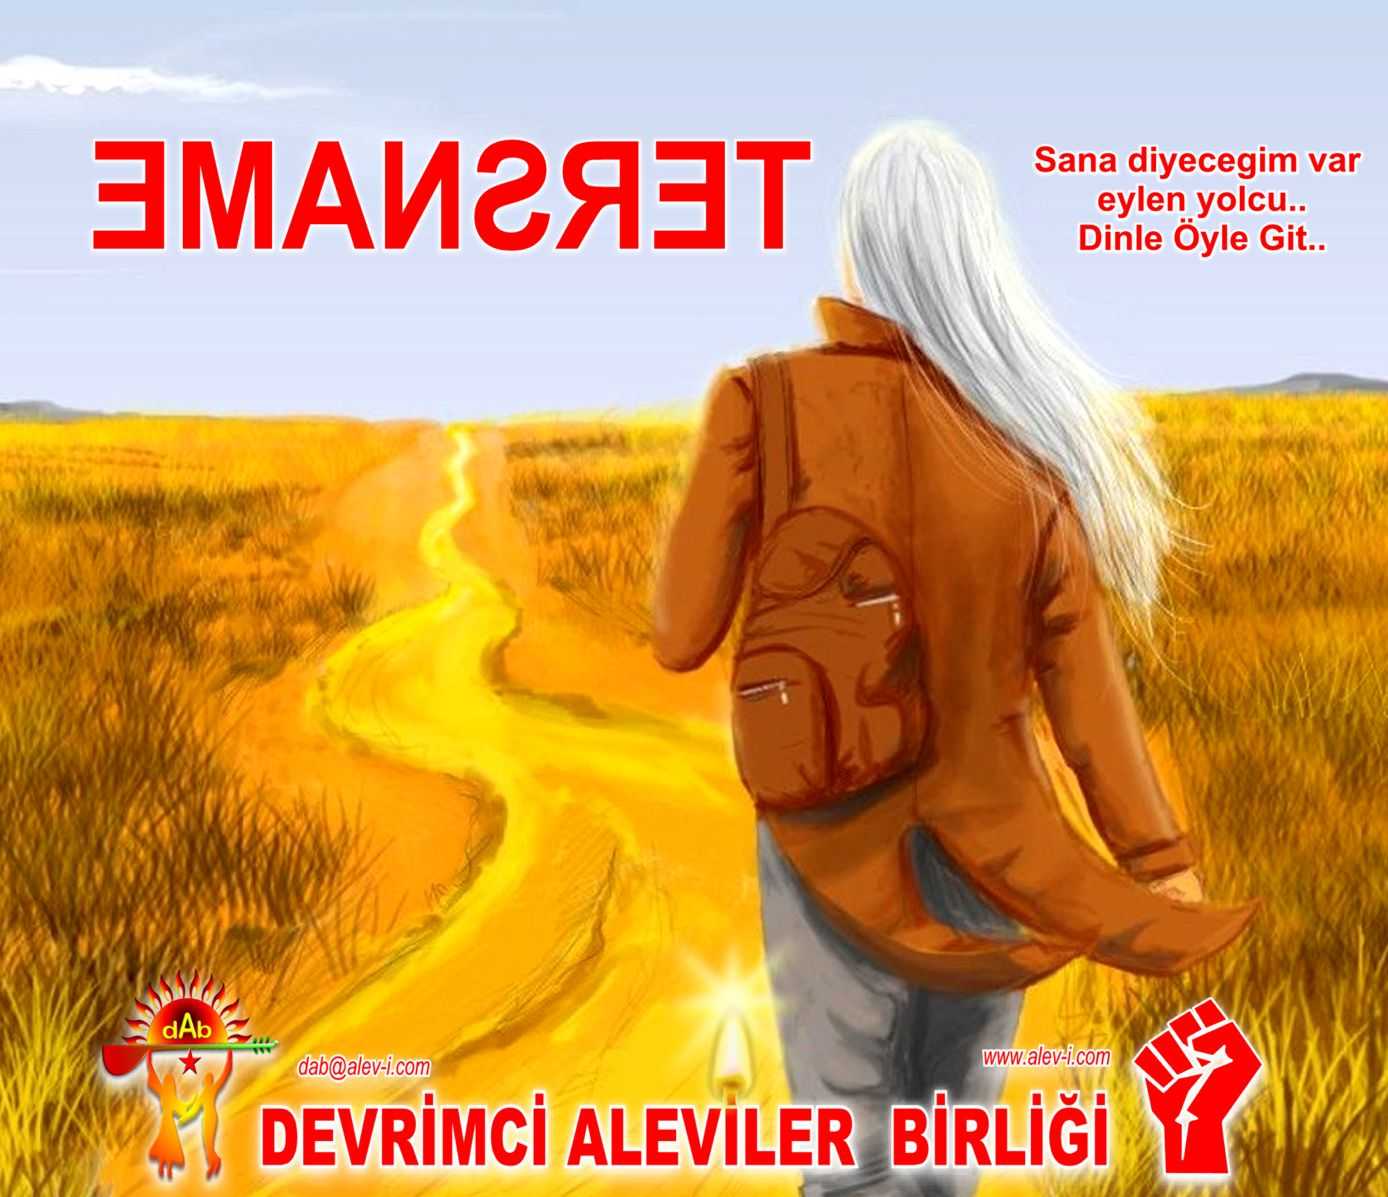 Devrimci Aleviler Birliği DAB Alevi Kızılbaş Bektaşi pir sultan cem hz Ali 12 imam semah Feramuz Şah Acar tersname yolcu DAb alevi